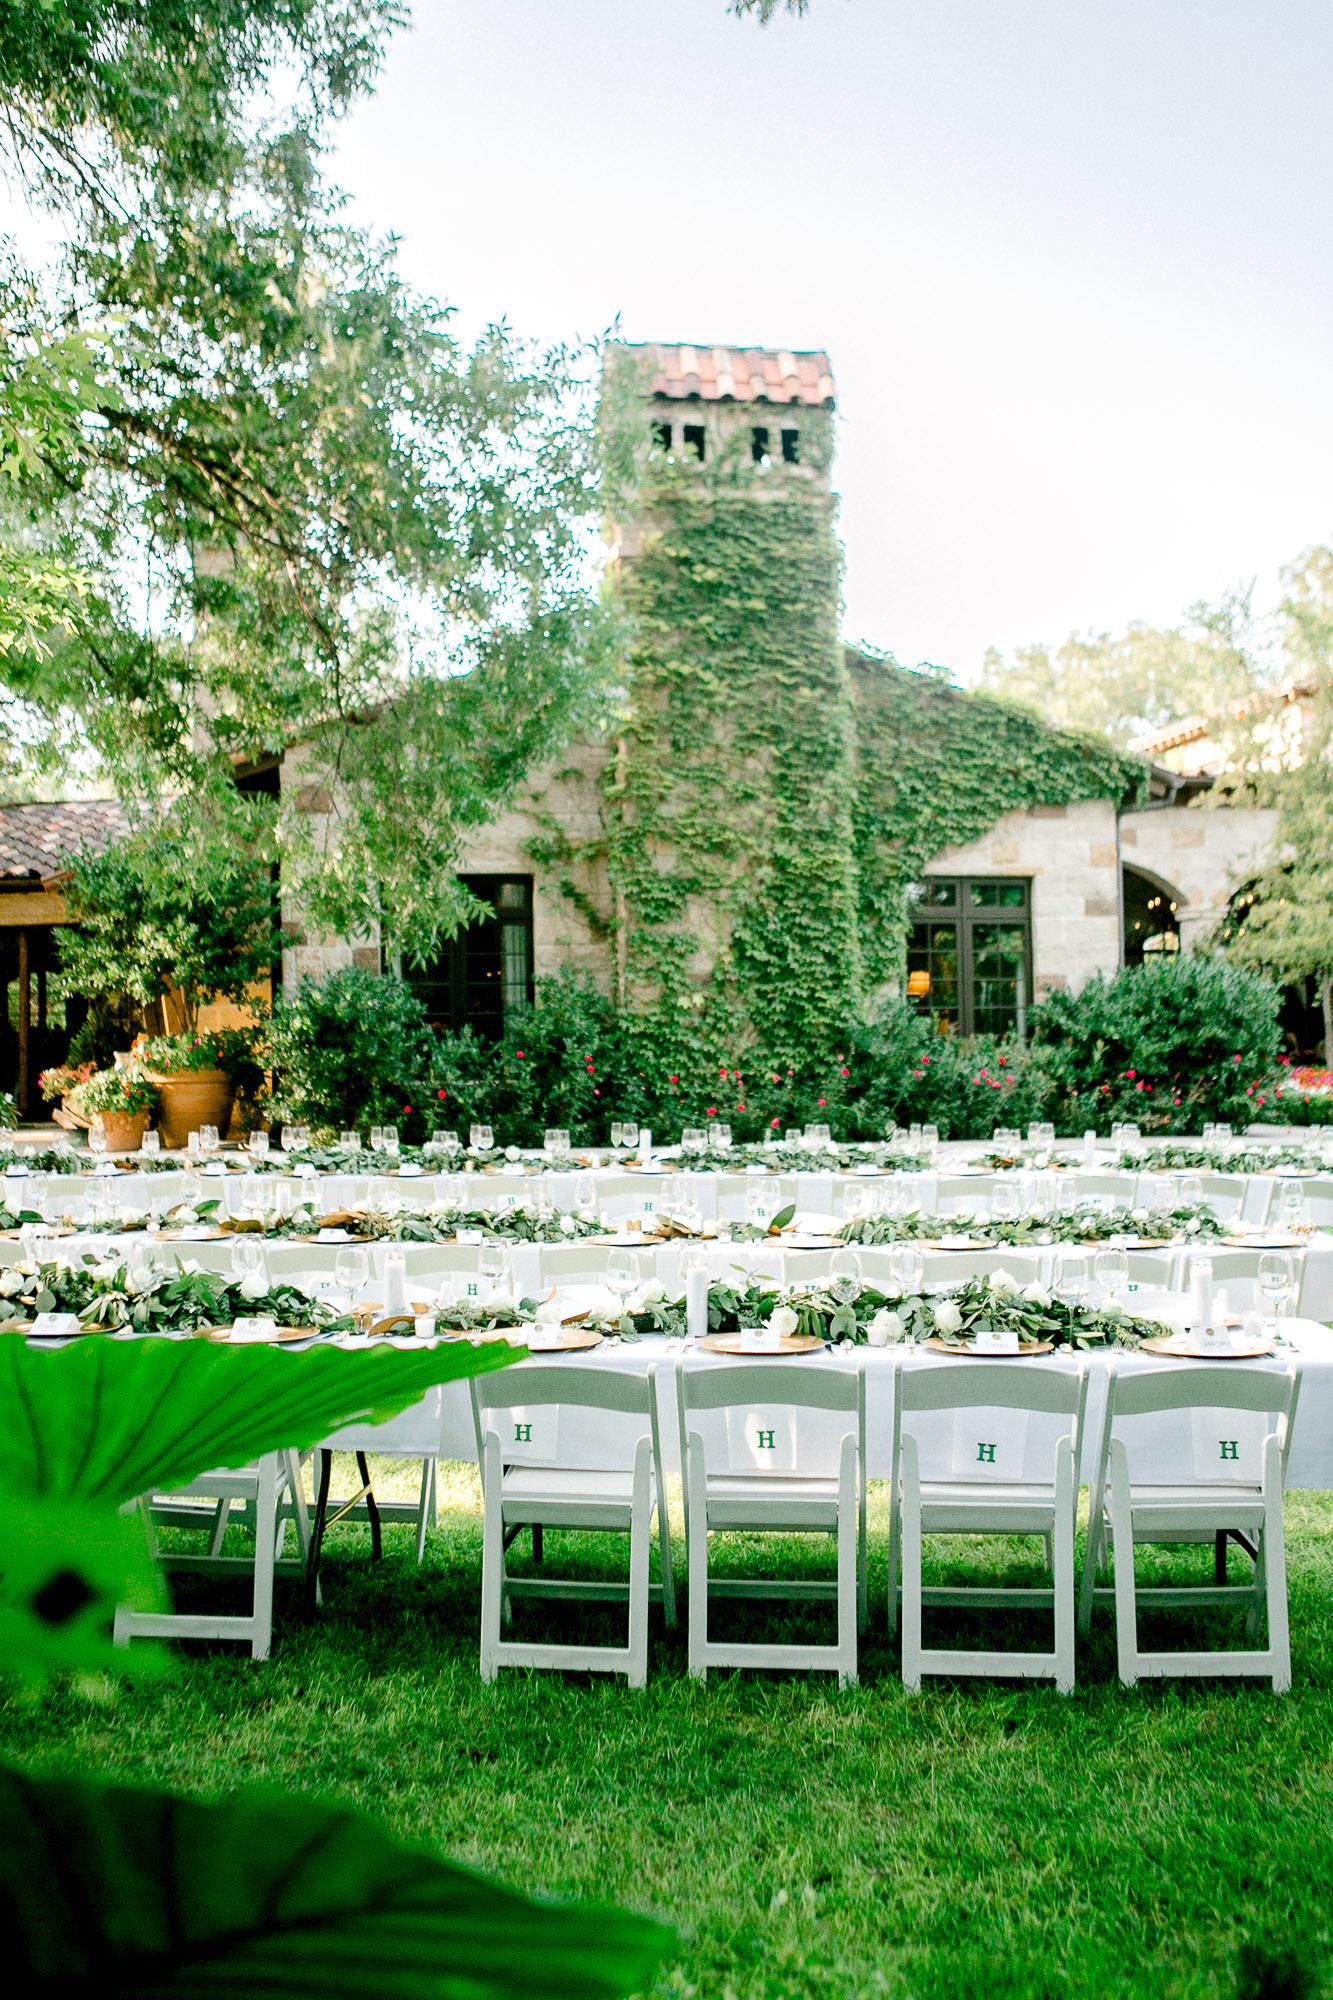 ali-brandon-hamilton-lubbock-wedding-photographer-estate-lee-lewis-construction-bee-alleej_0106.jpg